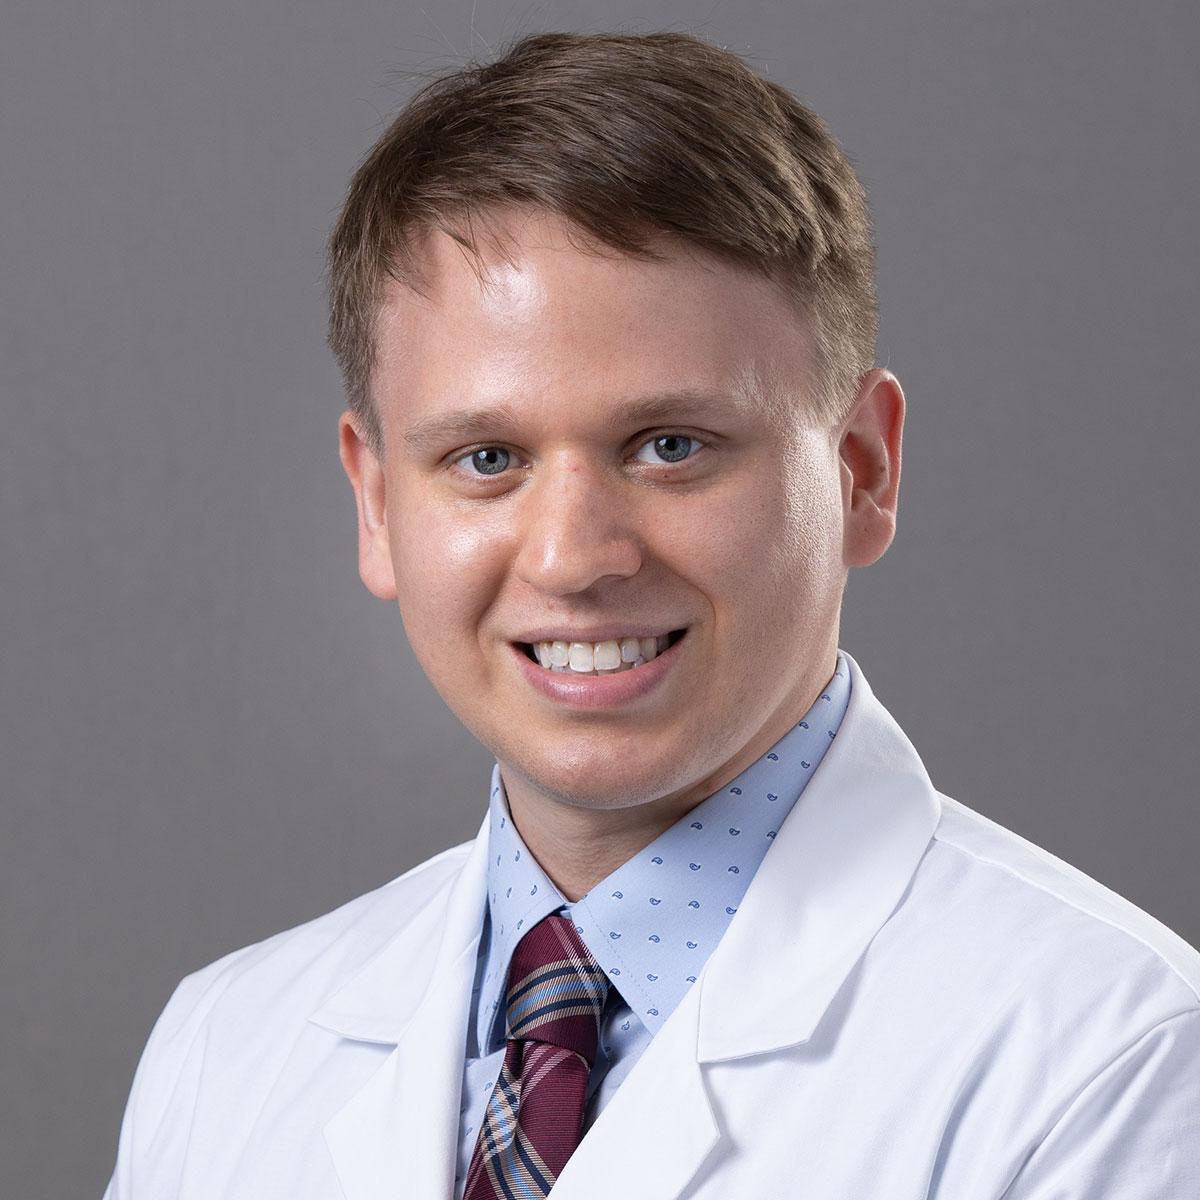 A friendly headshot of Dr. Myles McCrary